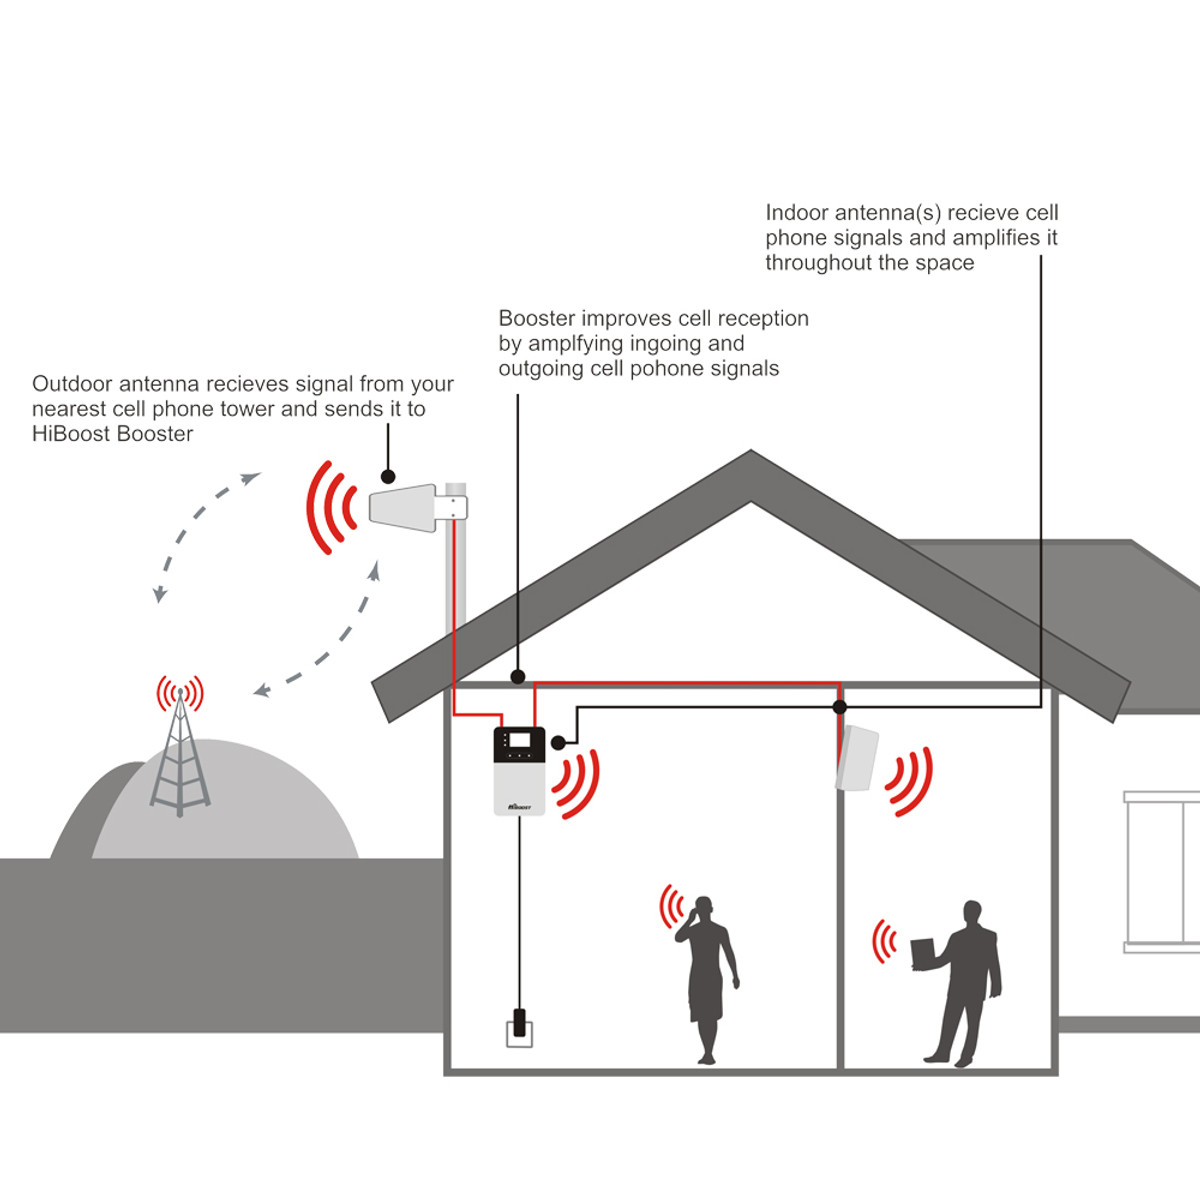 HiBoost Home 4K Plus Signal Booster Installation Configuration Diagram